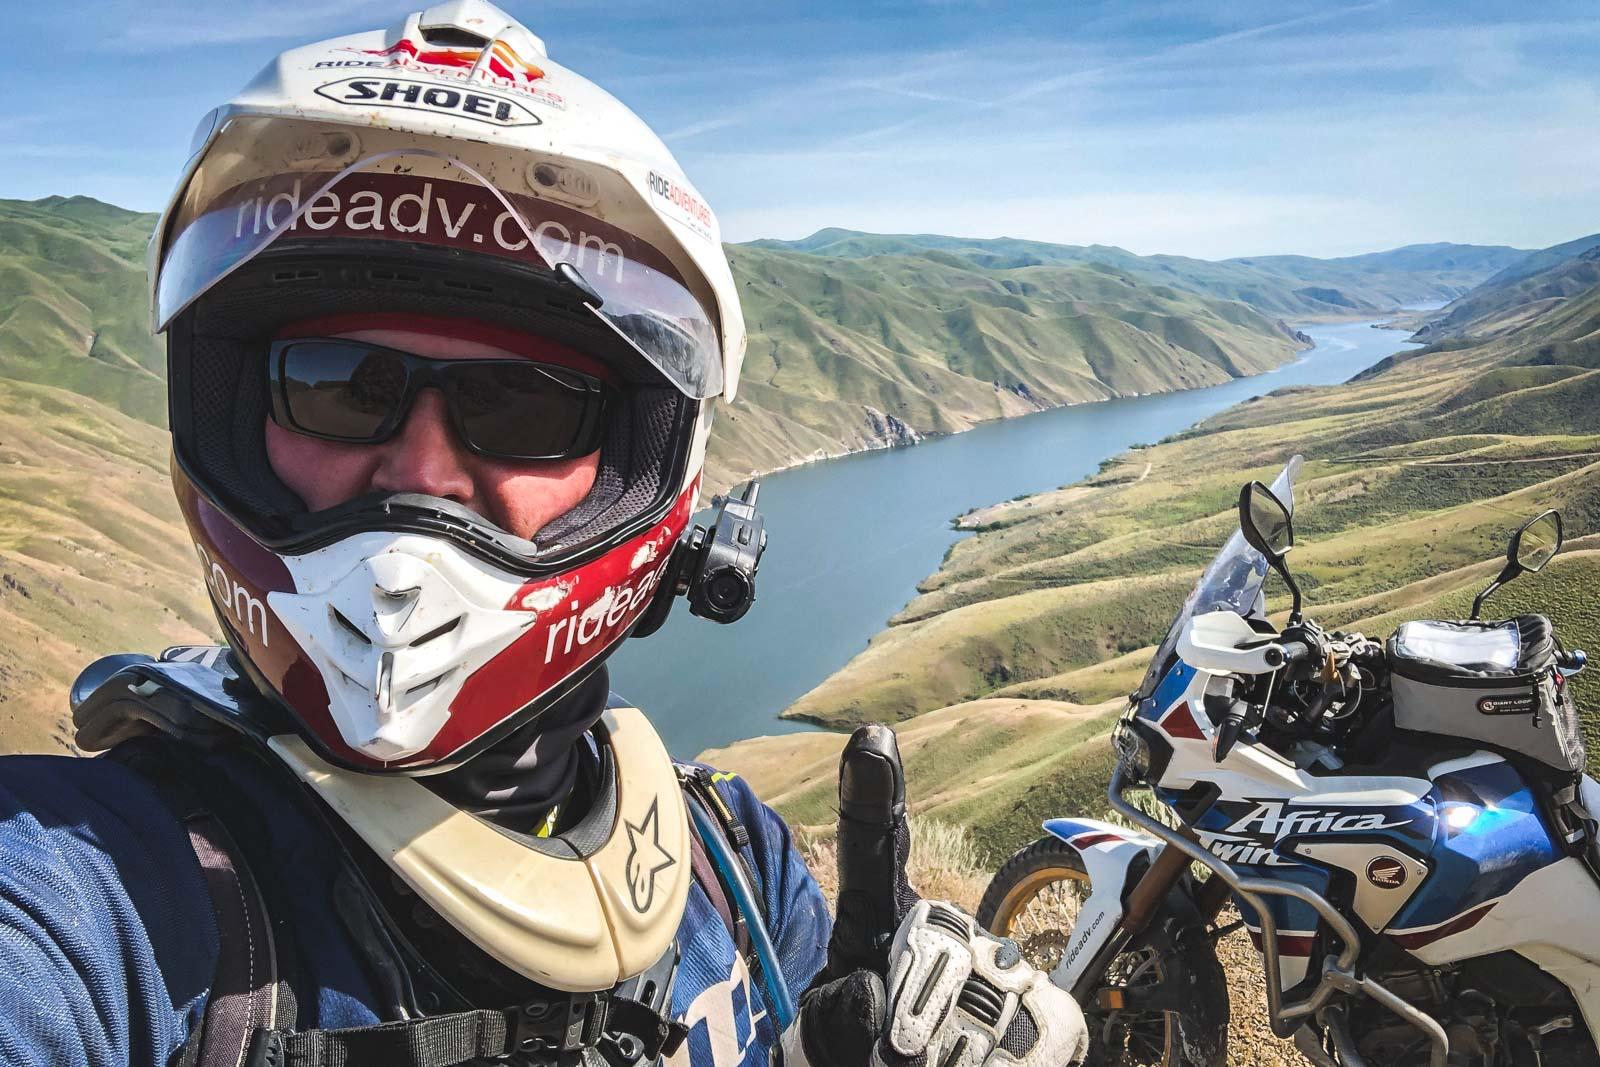 adventure_motorcycle_tour_oregon_eric